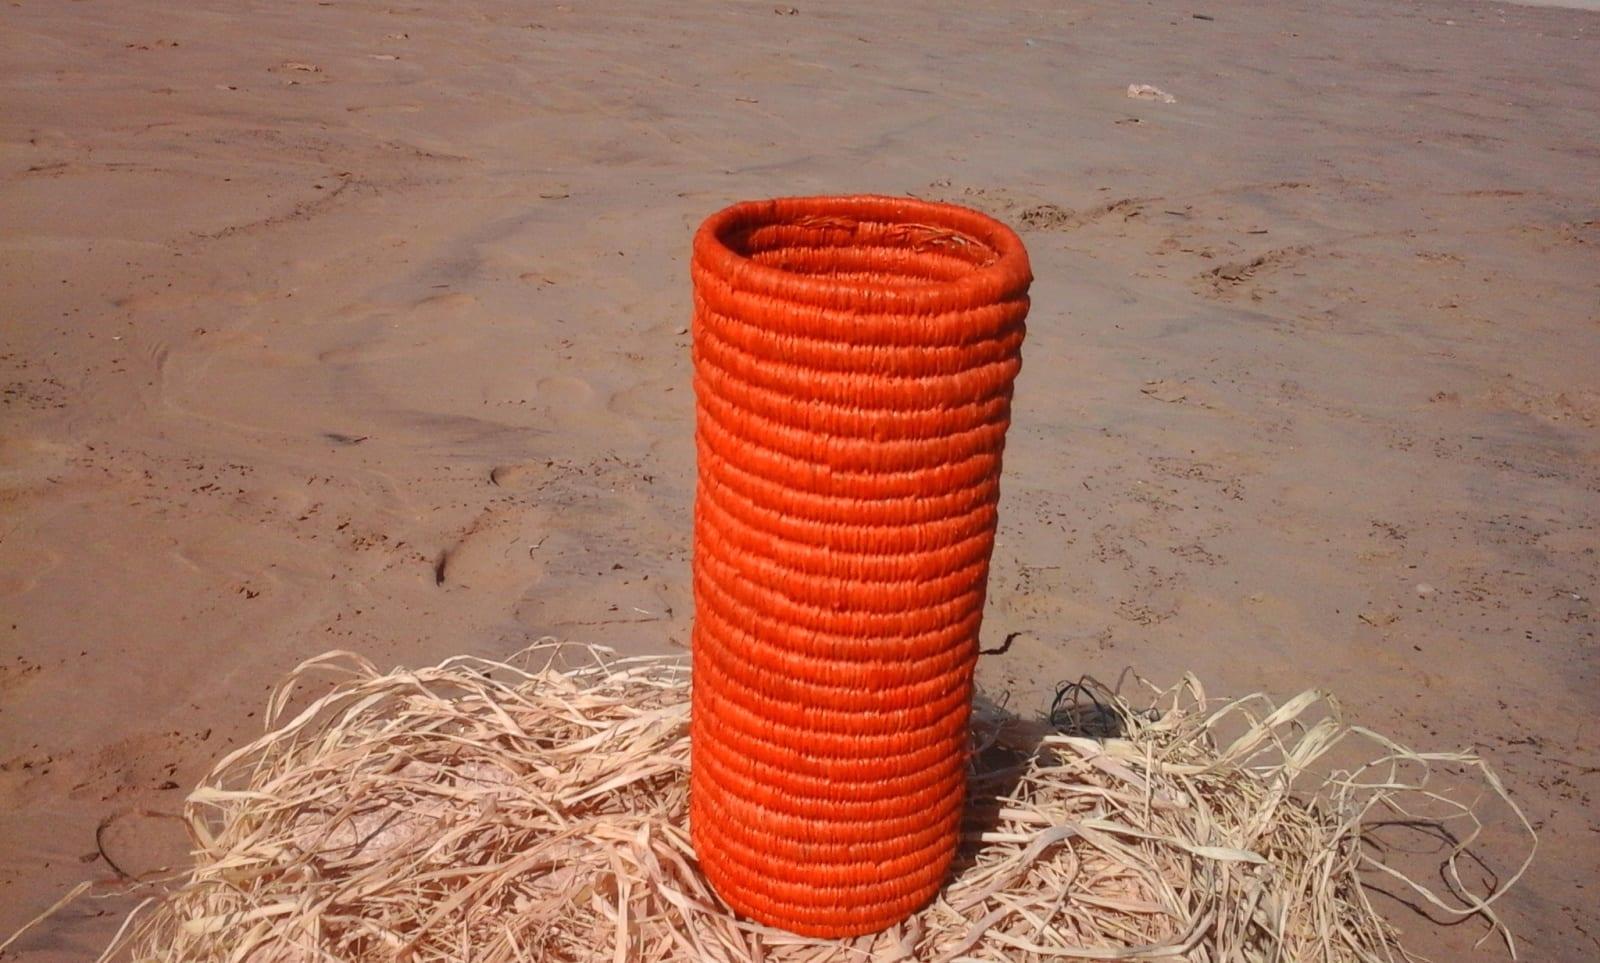 Bottle cover Dyed rafia fibers Orange Morocco